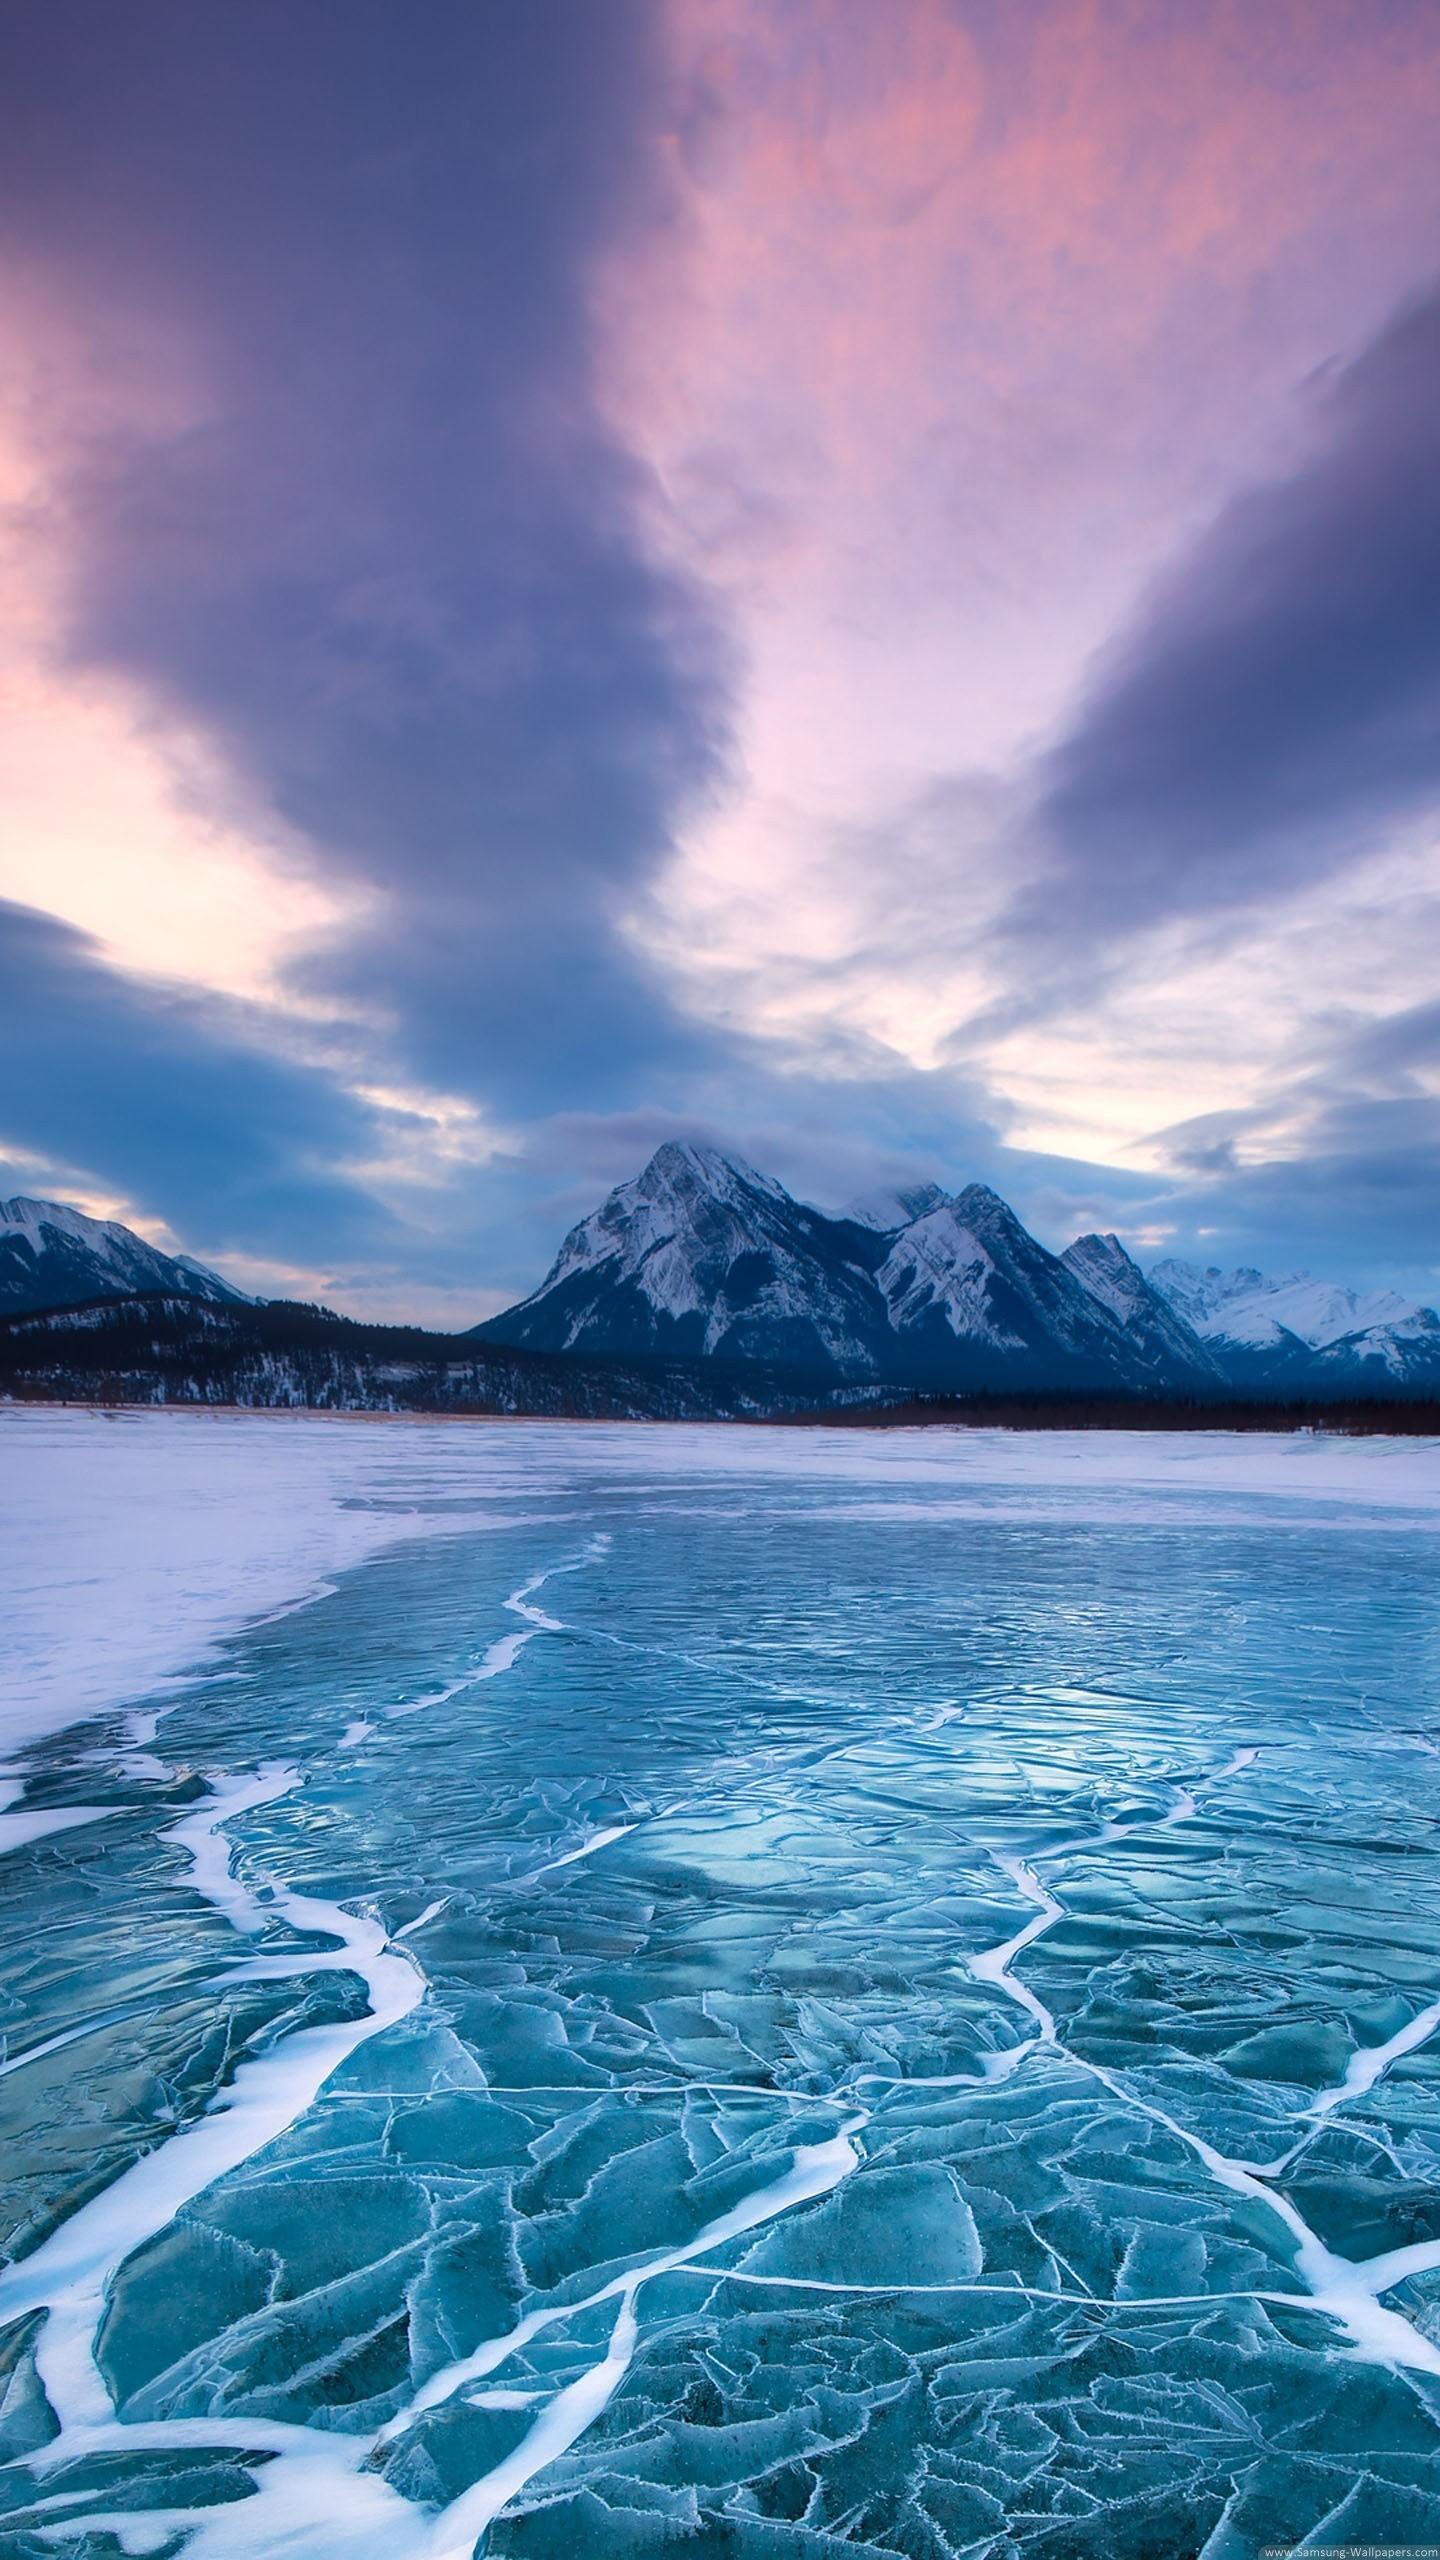 Good Wallpaper Mountain Google Nexus - mountain-and-ice-lake-wallpaper-background-1440x2560  Picture_519387.jpg